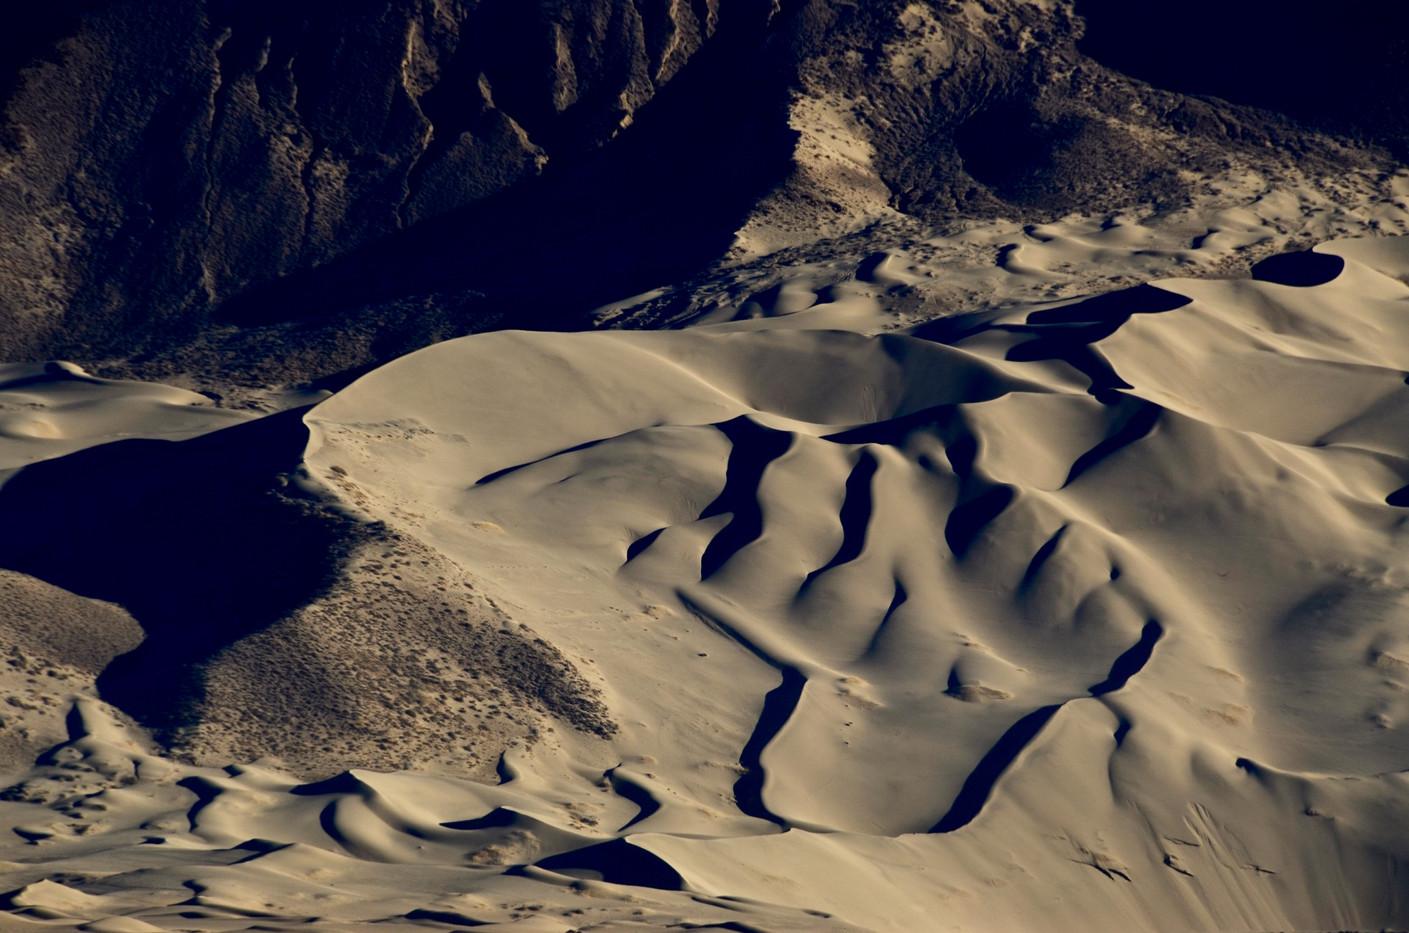 River Silt Settles in the Mountains - Tibet